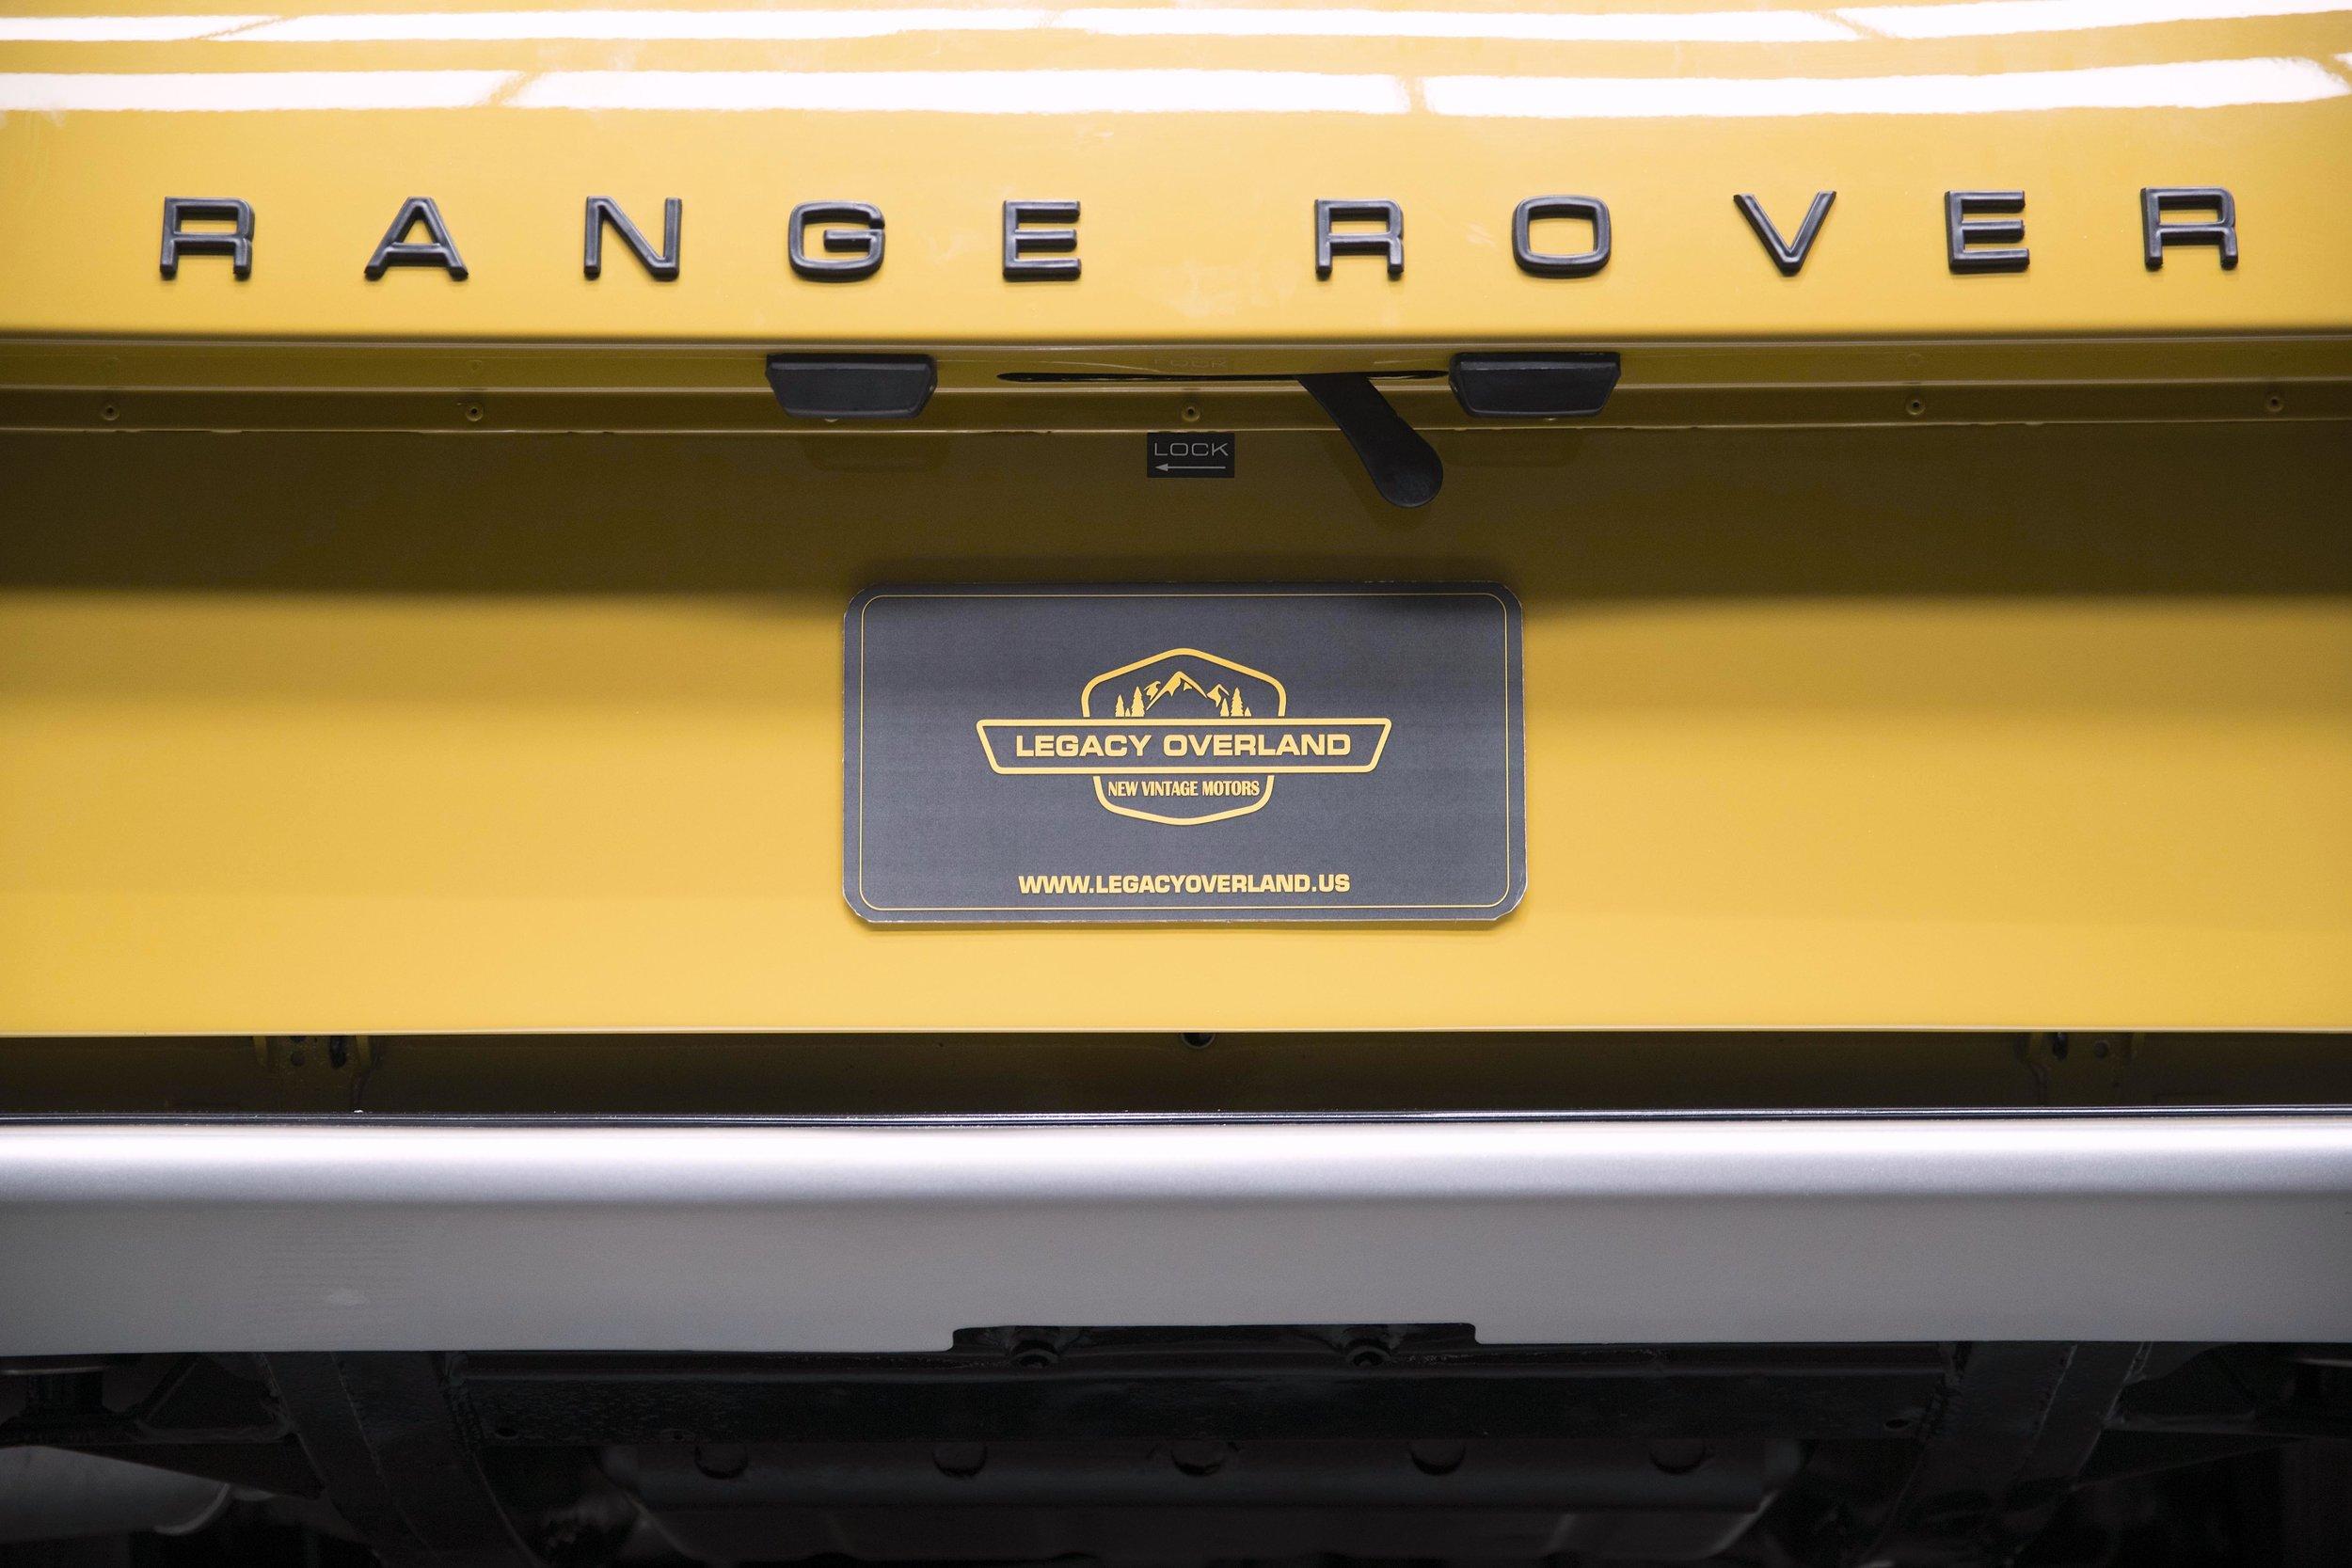 LegacyOverland_1973_RangeRover_shop16.jpg